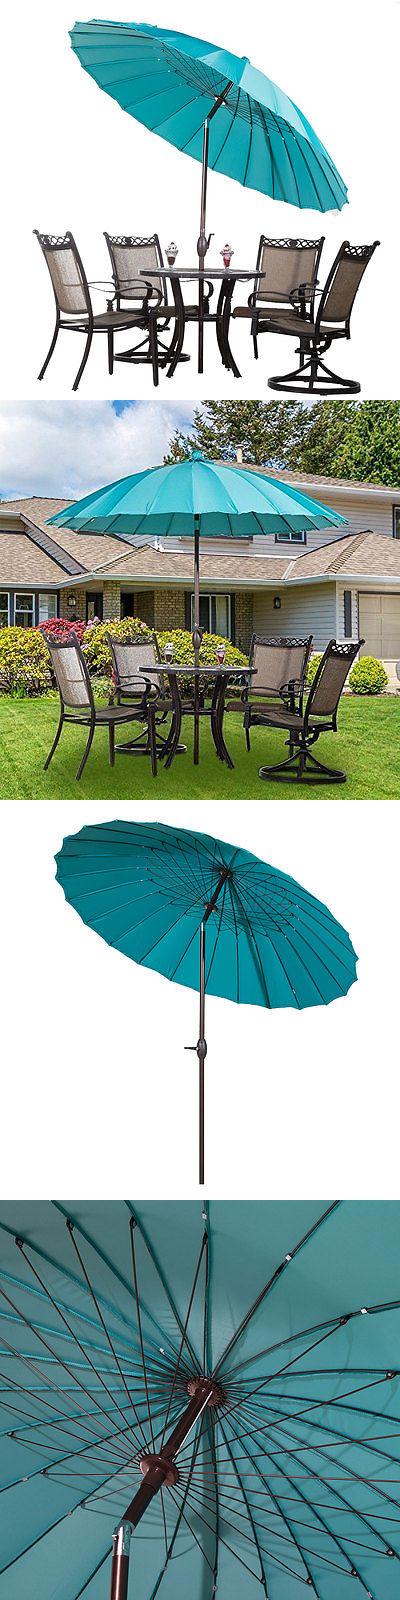 Umbrellas 180998: 8.5 Round Outdoor Patio Umbrella 24 Steel Wire Ribs W  Crank Tilt